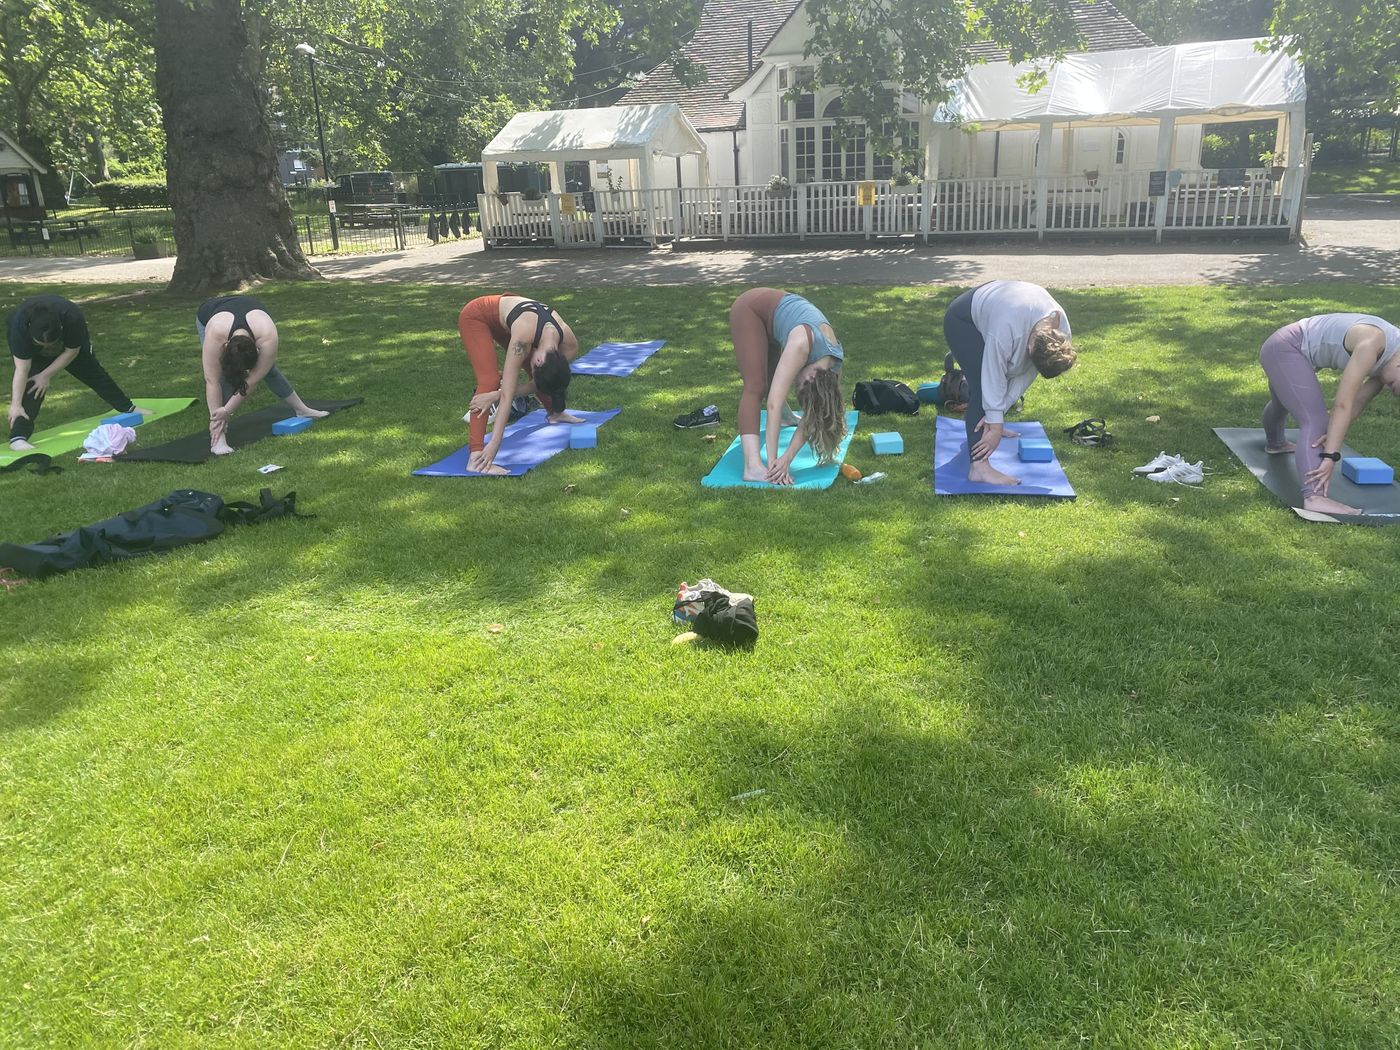 Please join me for yoga vinyasa in Kennington Park tomorrow at 10am